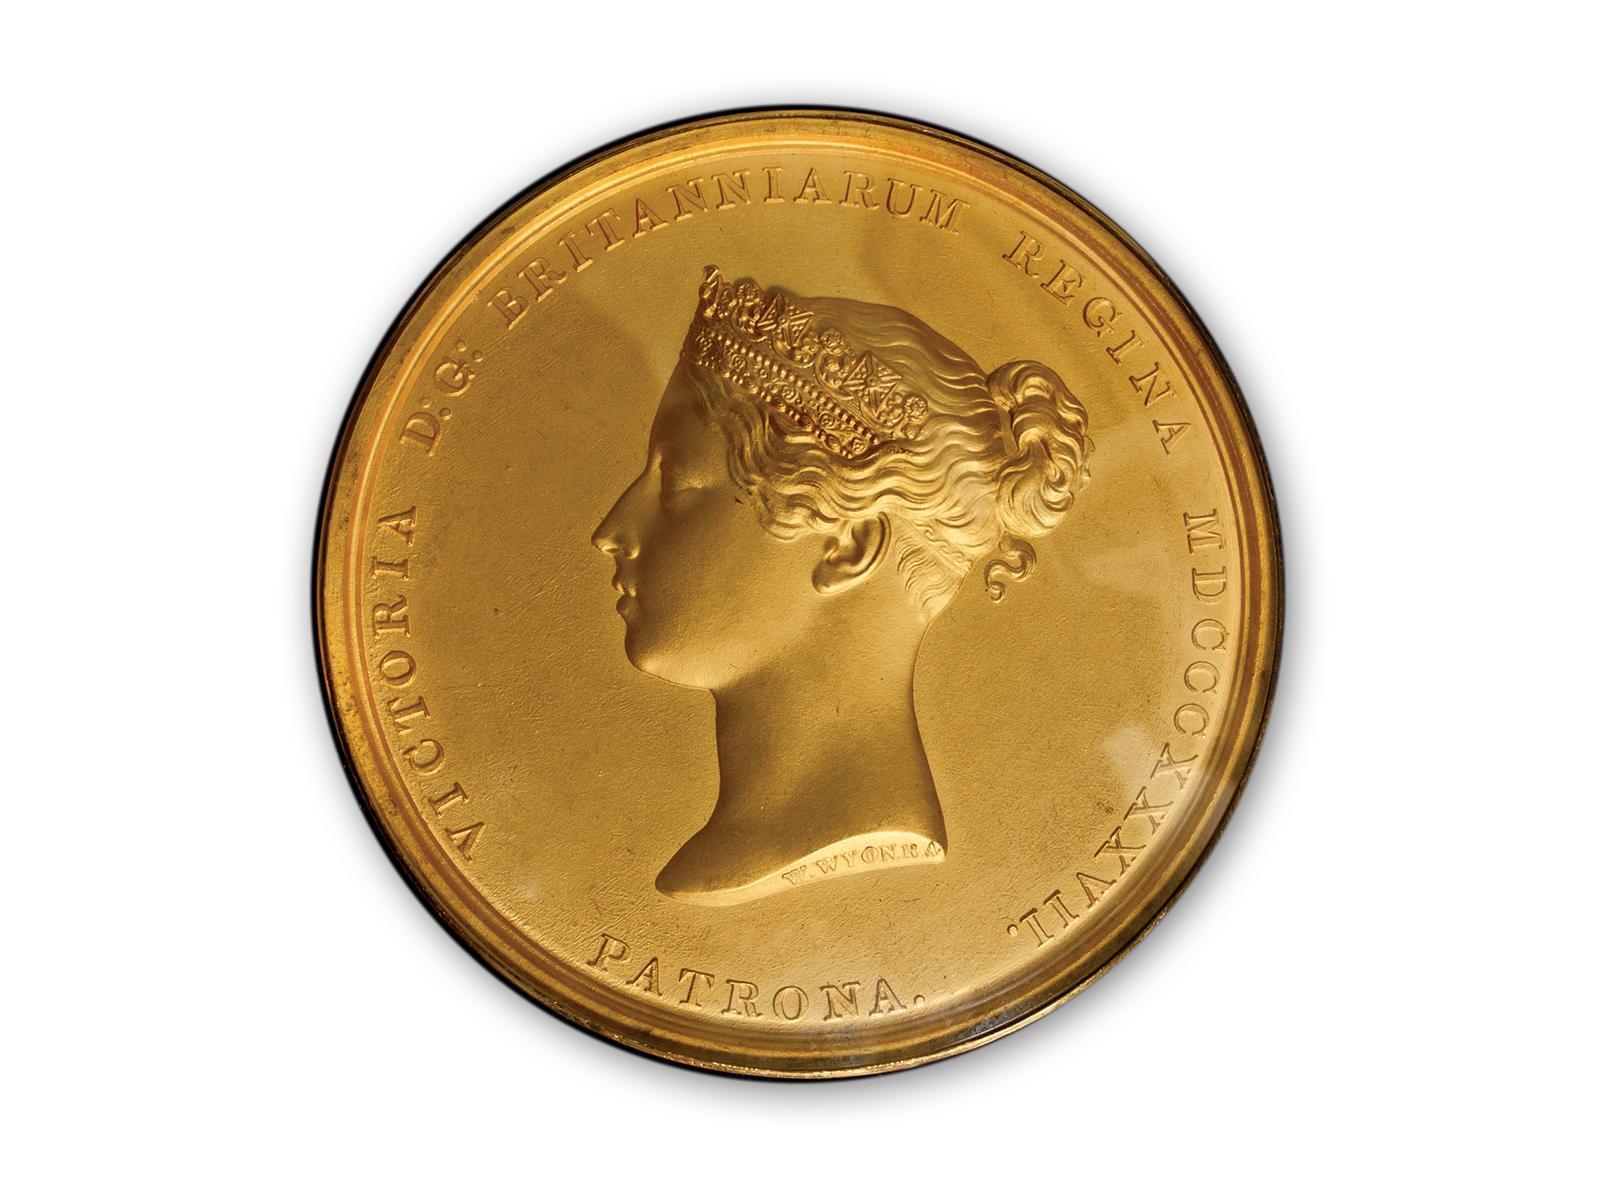 Edward Robinson's 1842 Medal